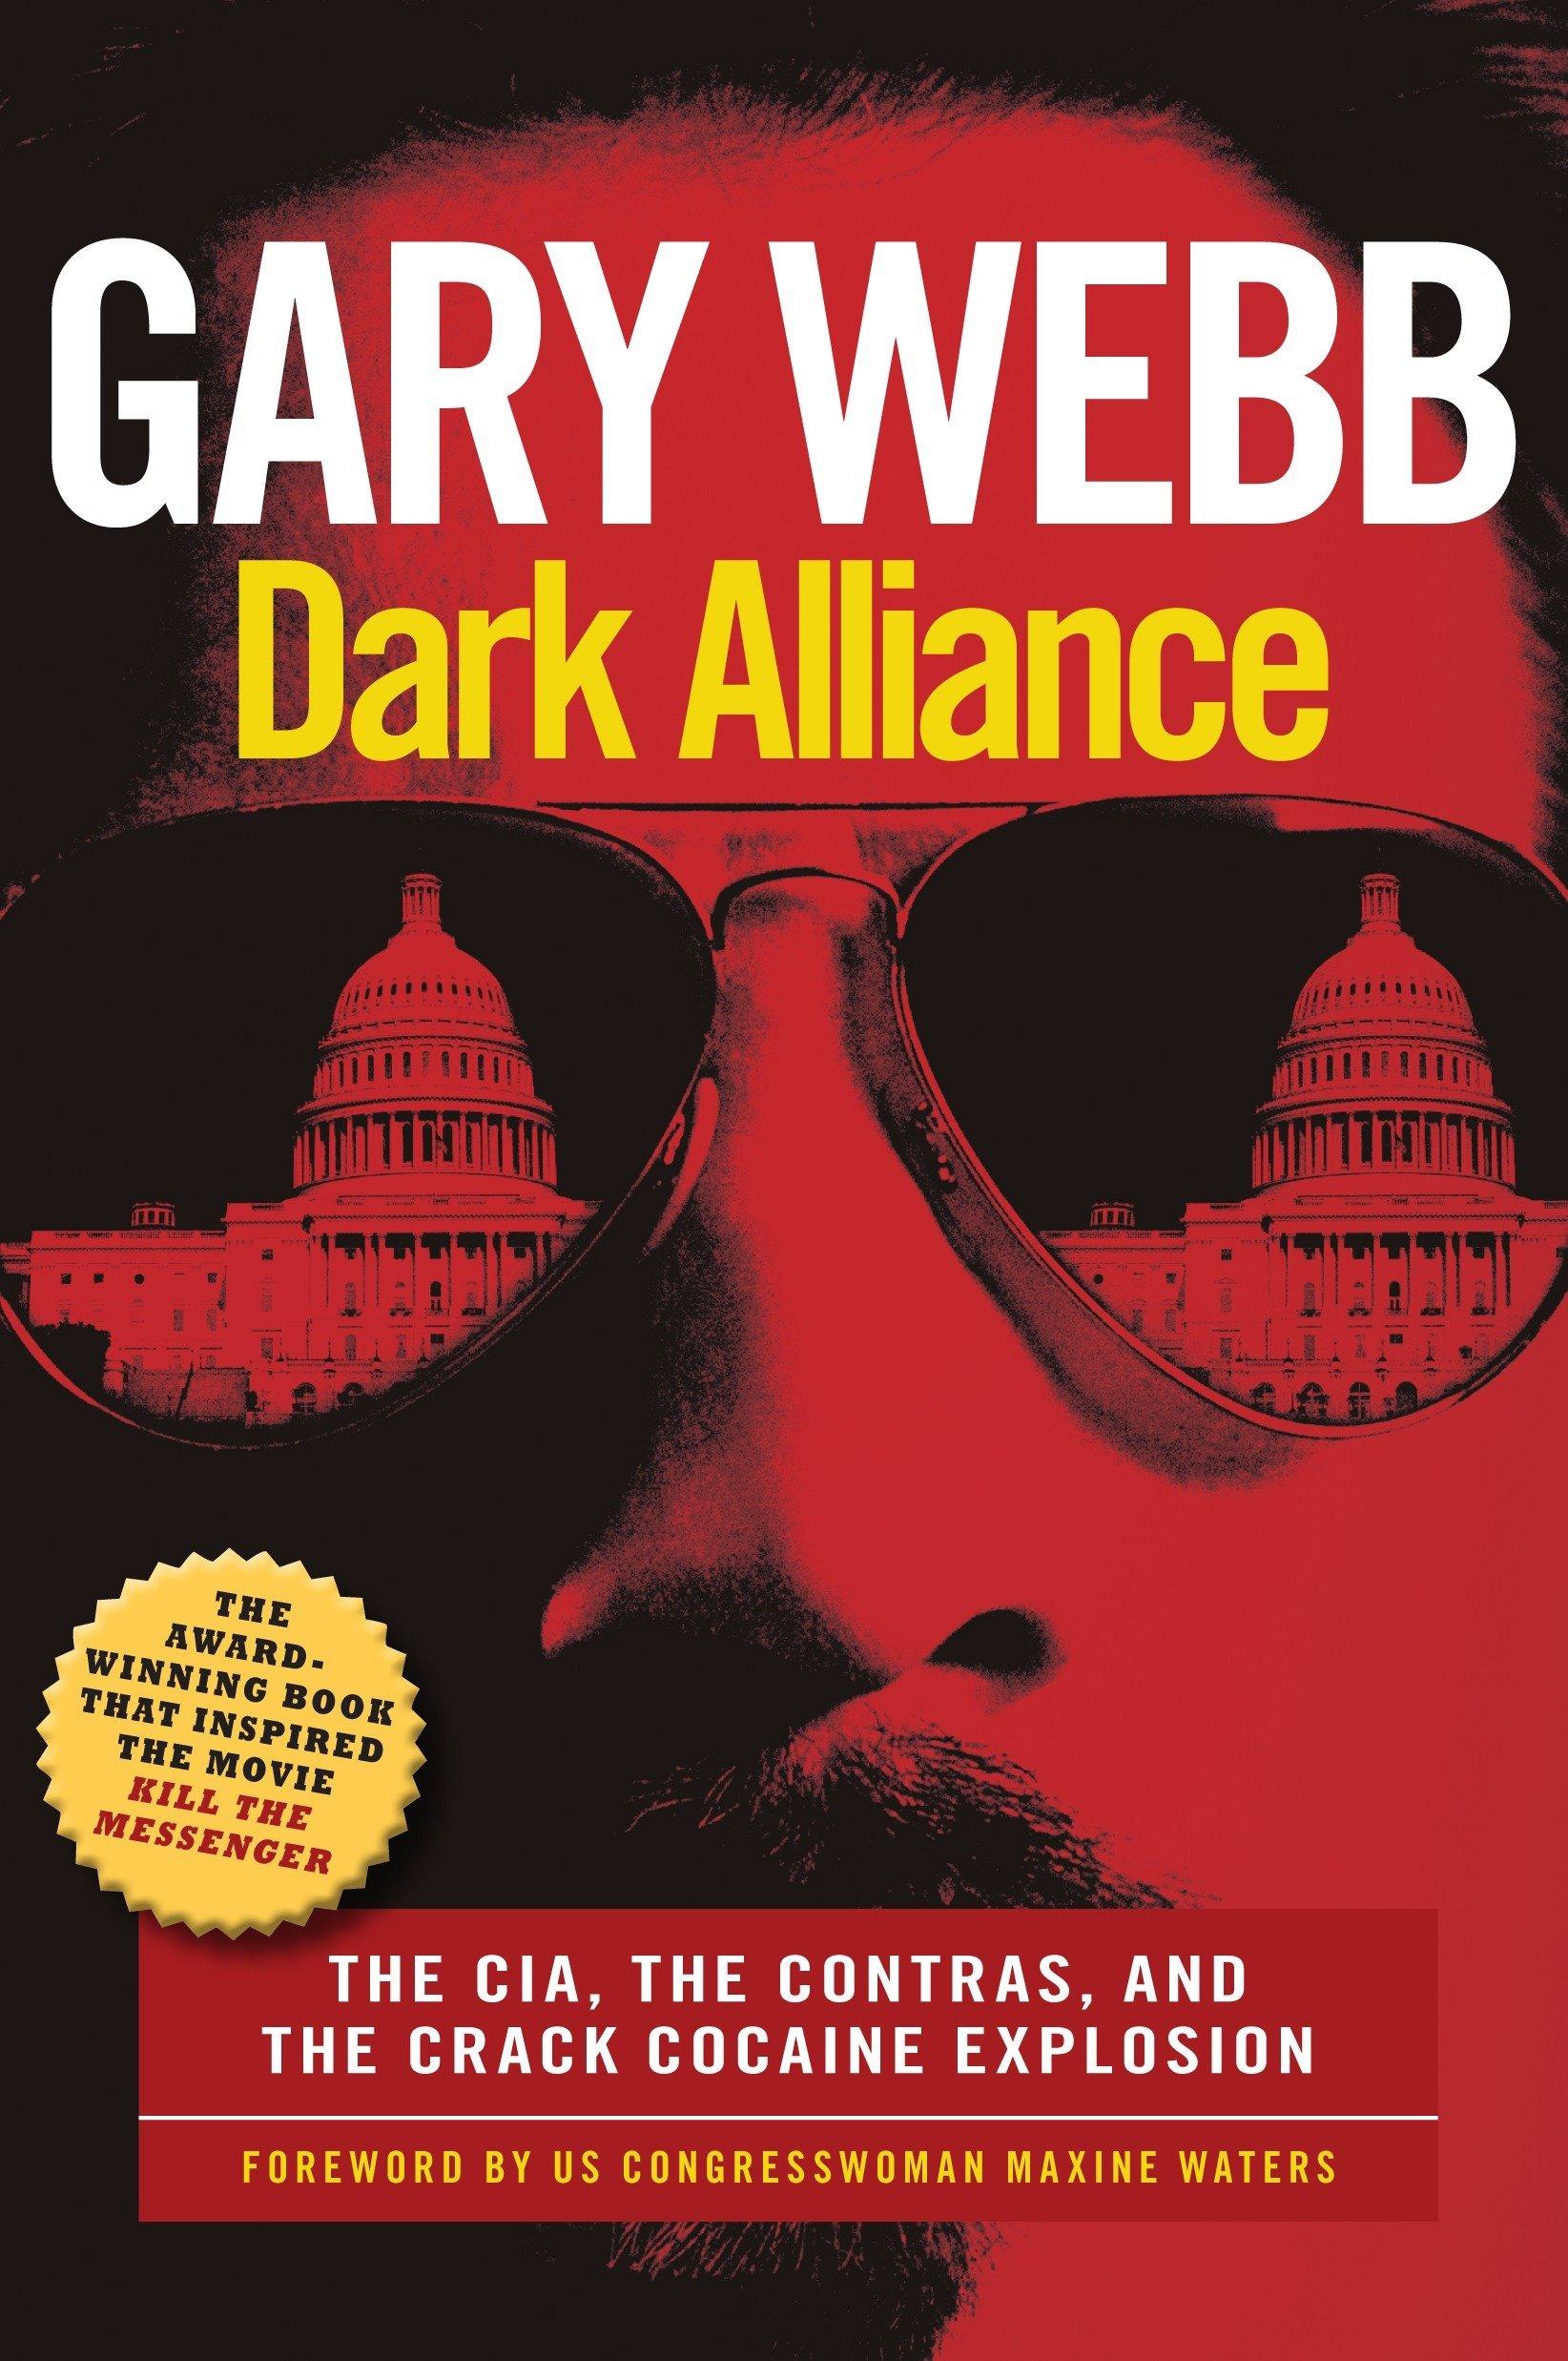 Image result for dark alliance gary webb book